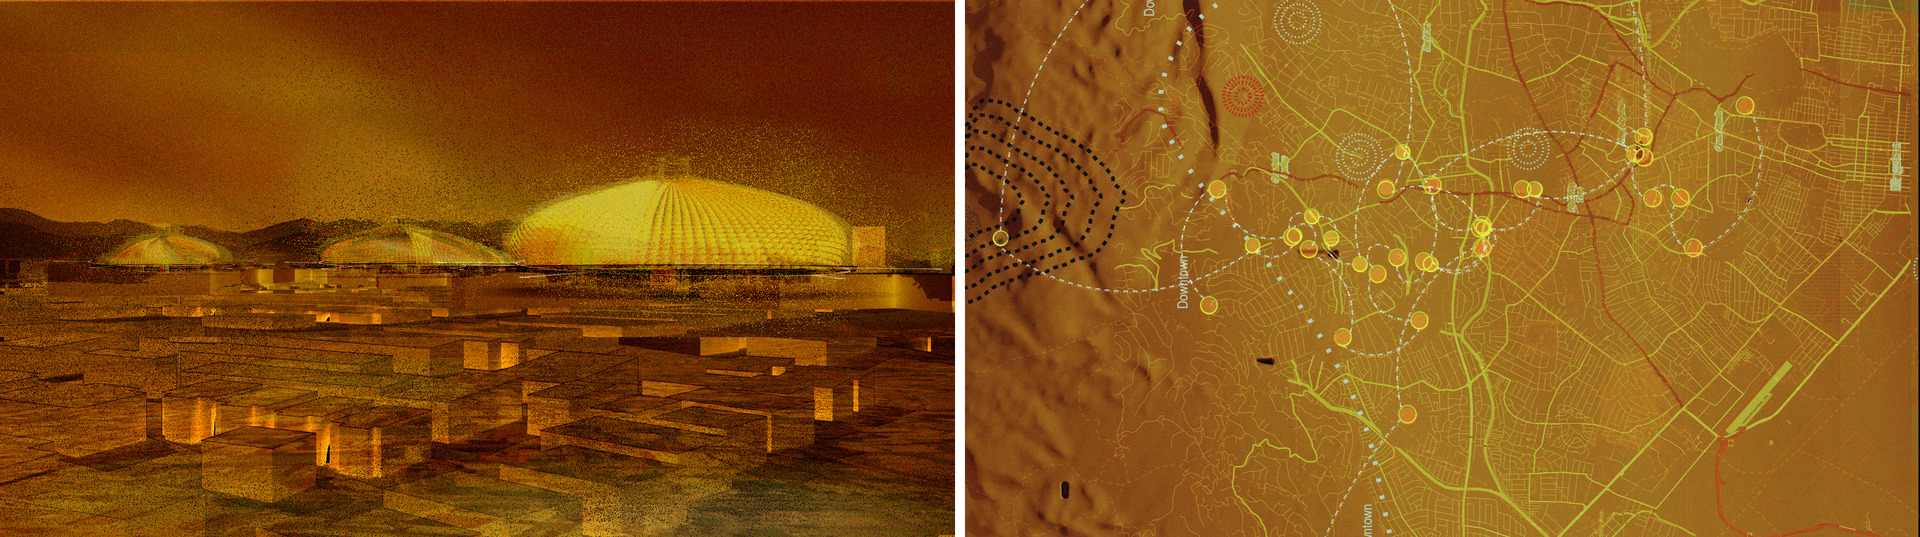 Melanoness Centres - Radiant Suns    Movement Paths